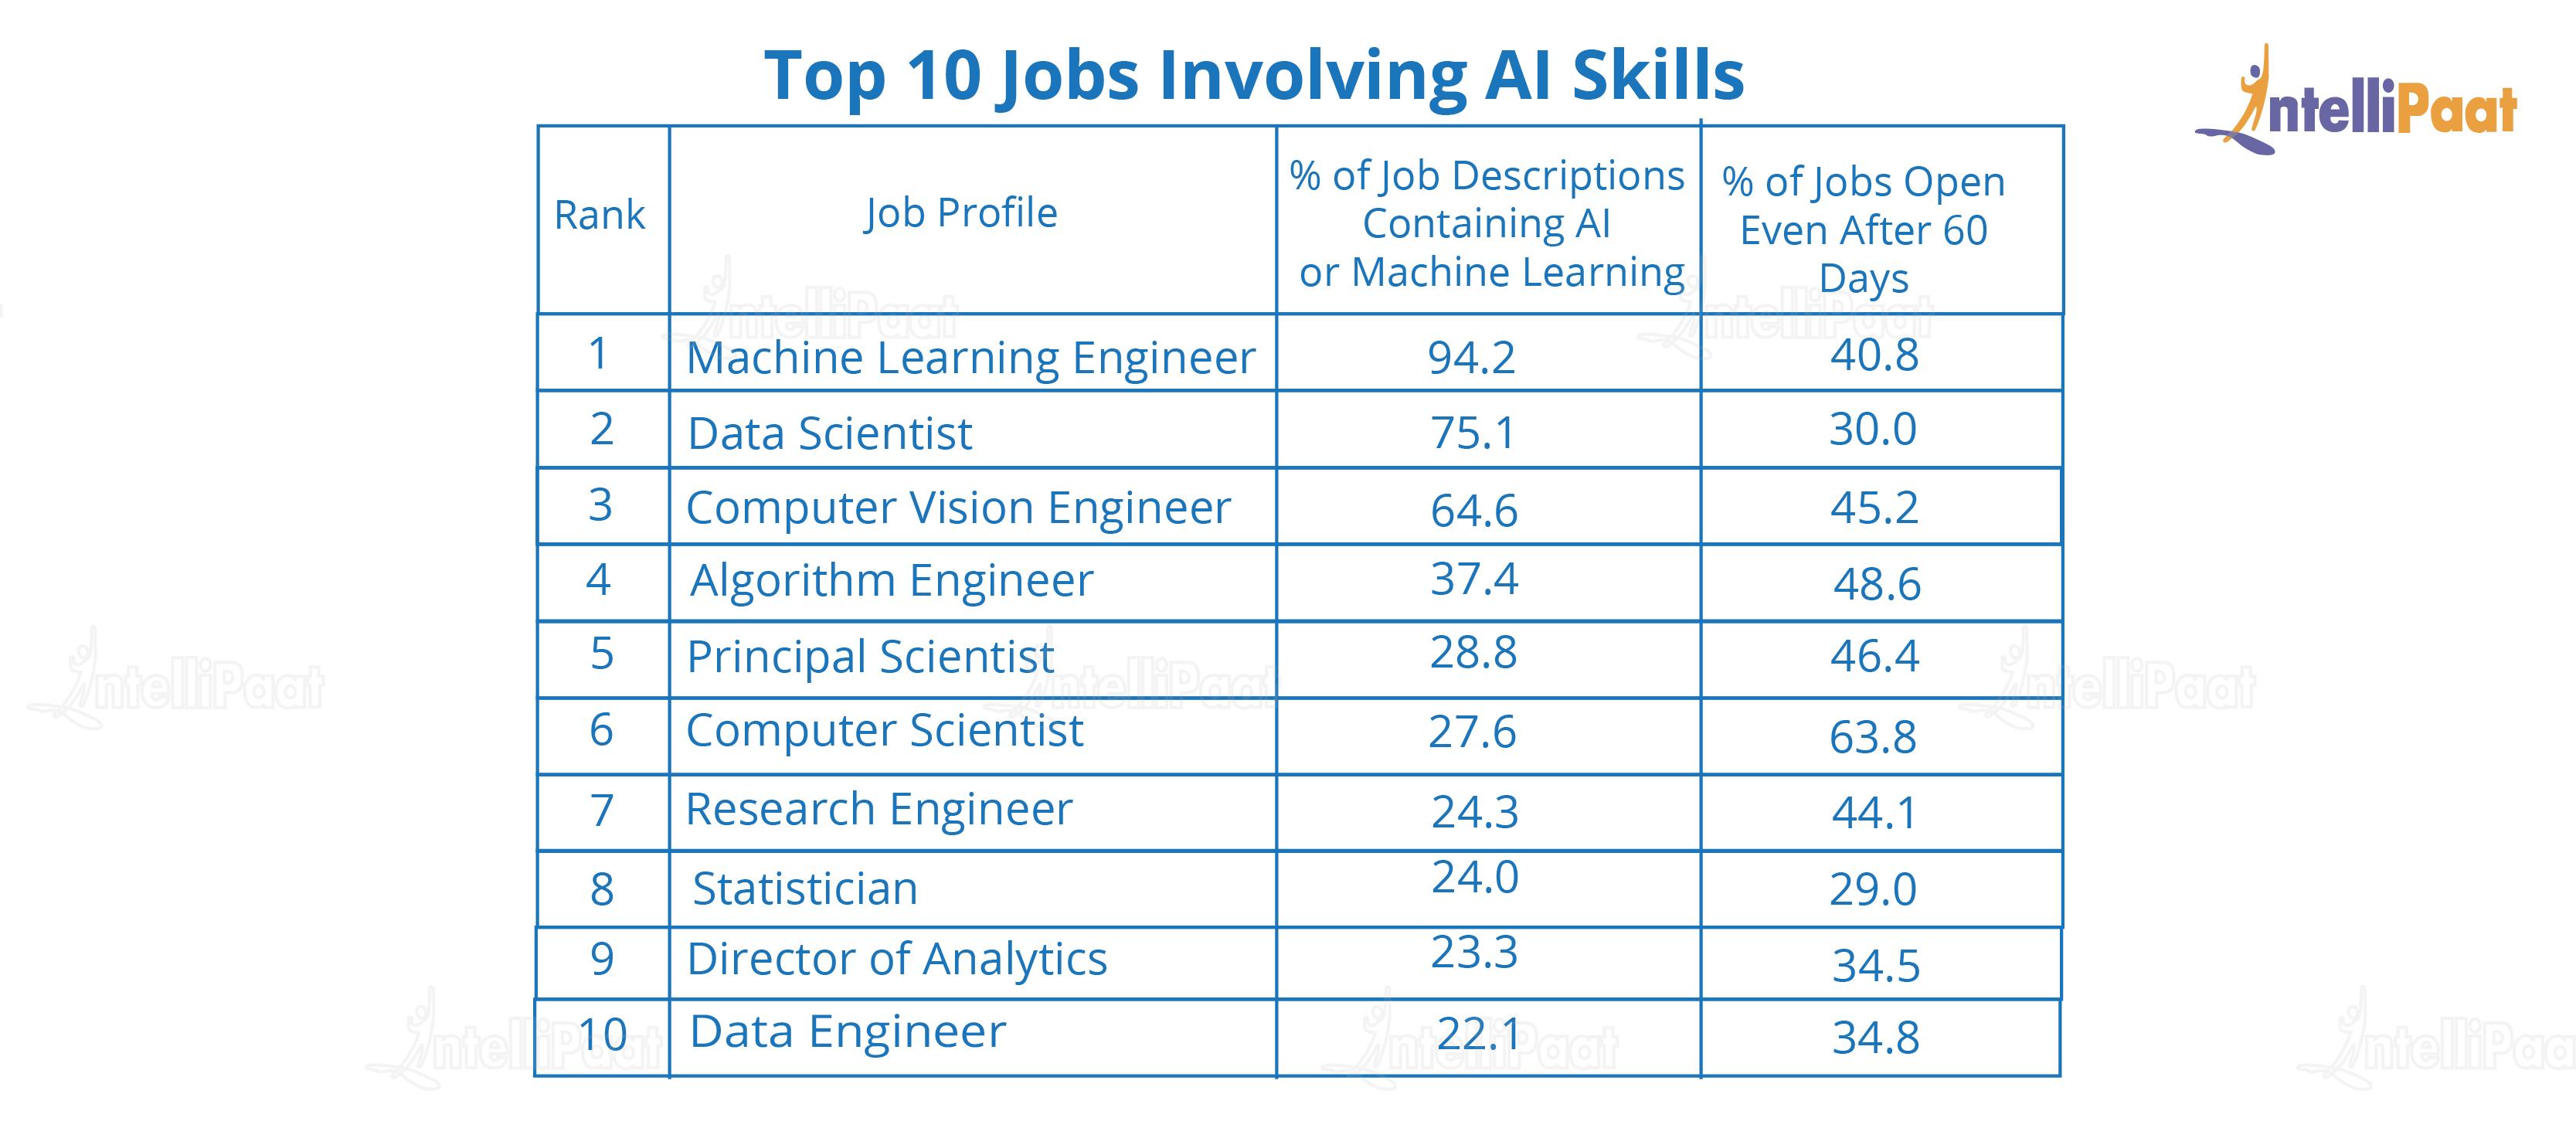 Top 10 AI Jobs